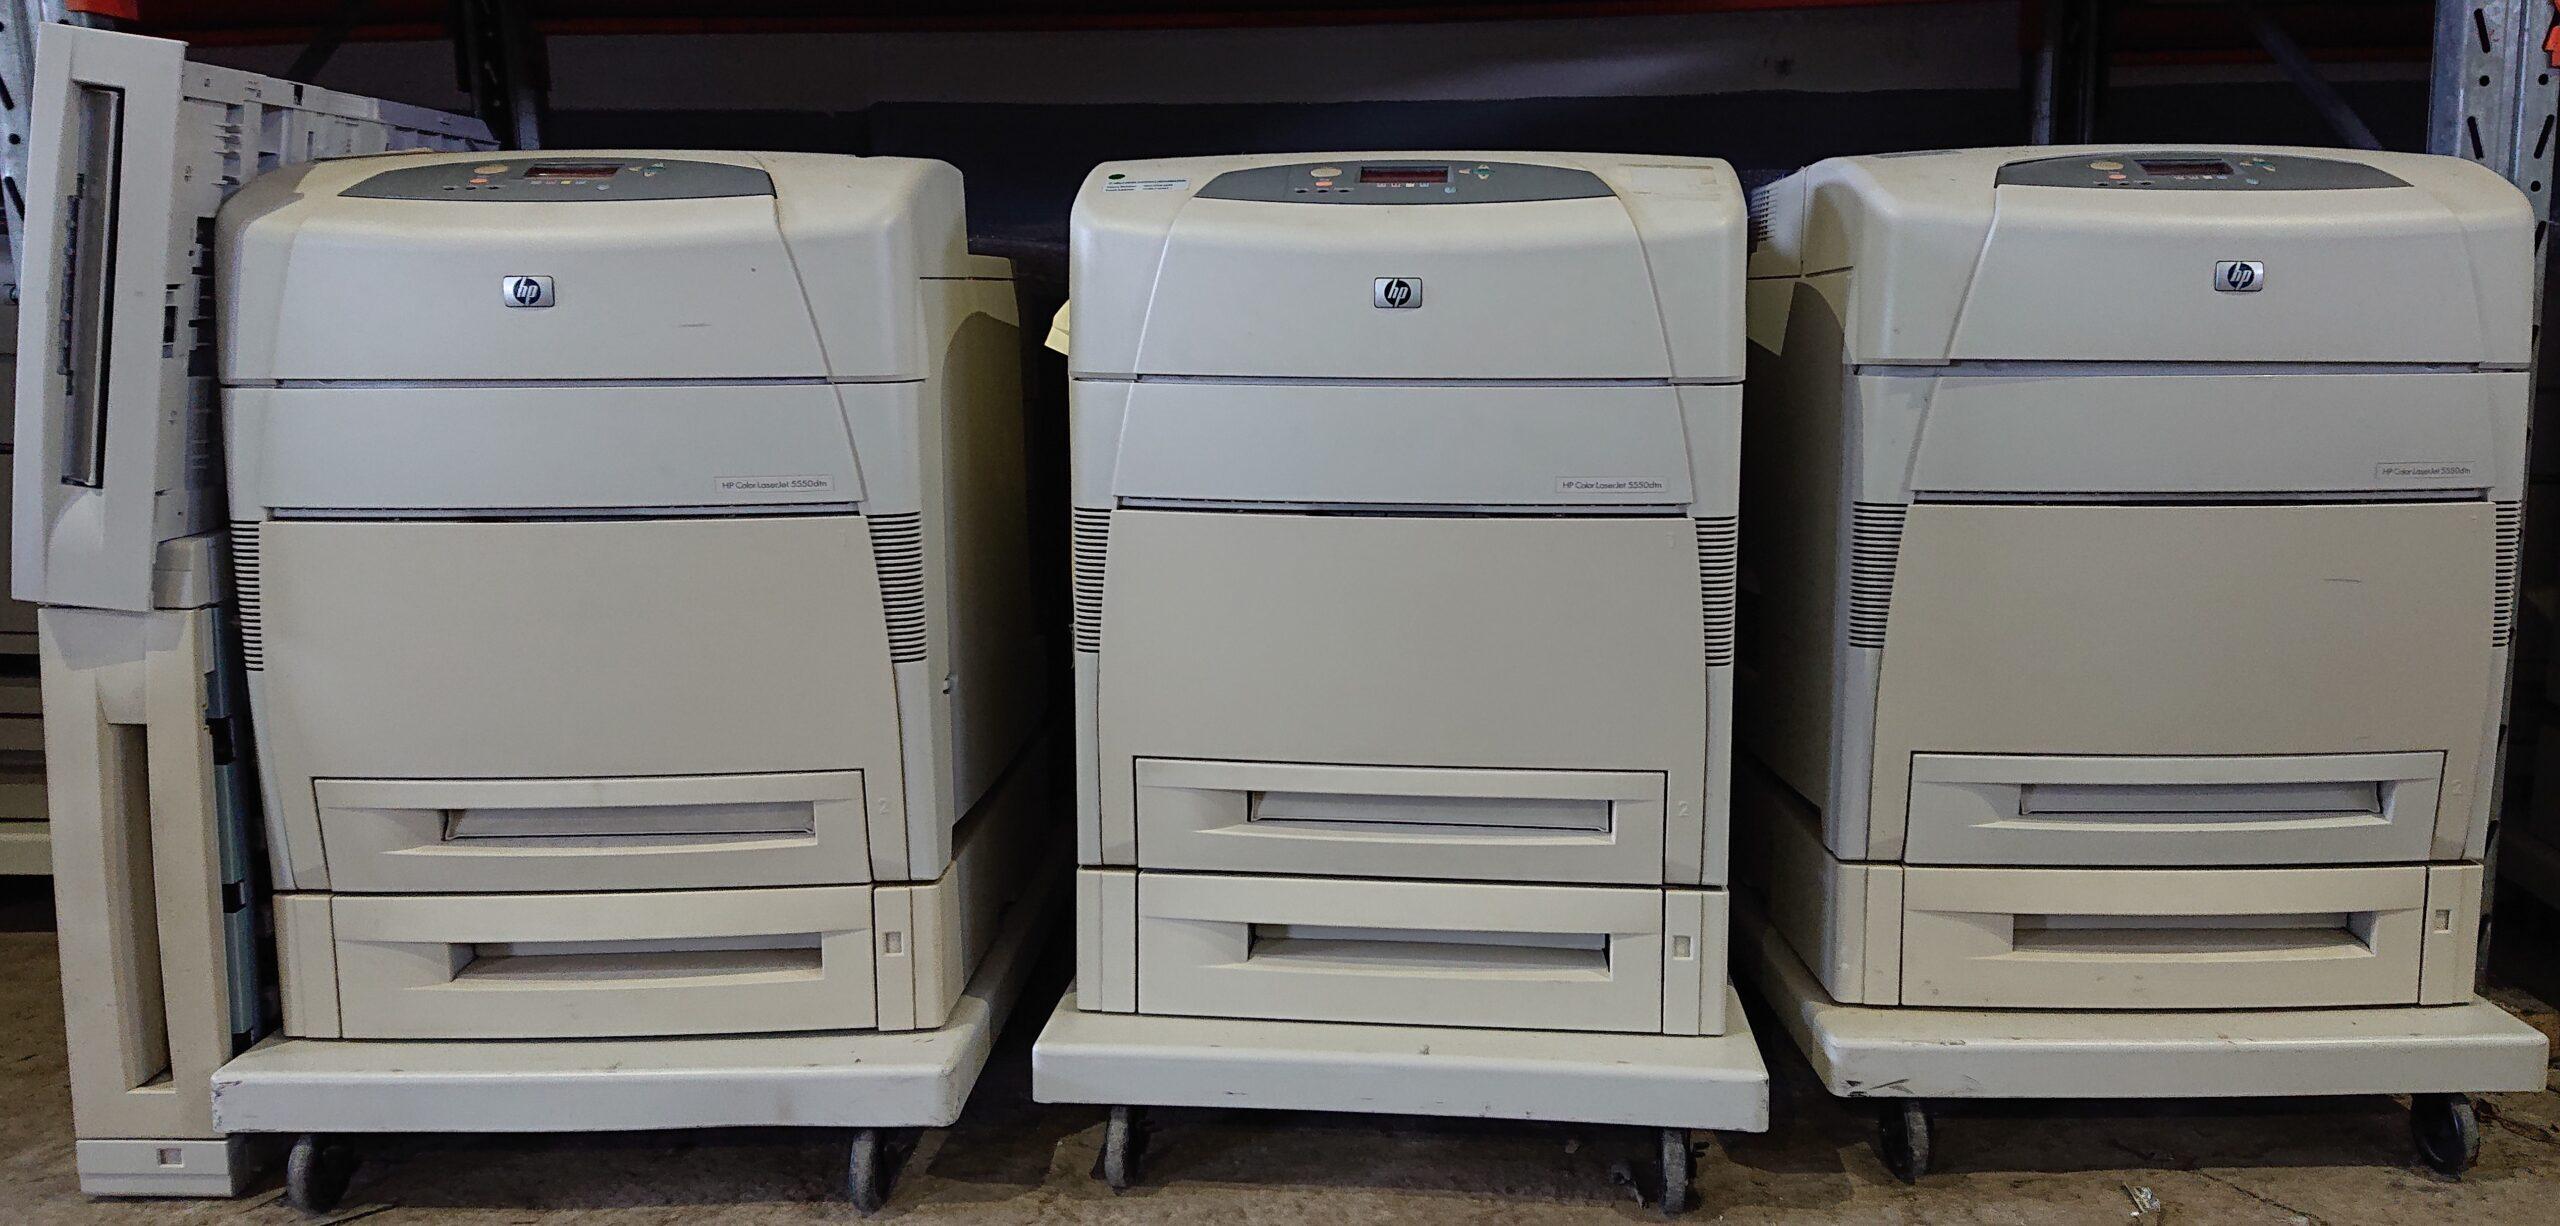 Принтеры HP LaserJet 5500/5550, б/у (20-421-4)